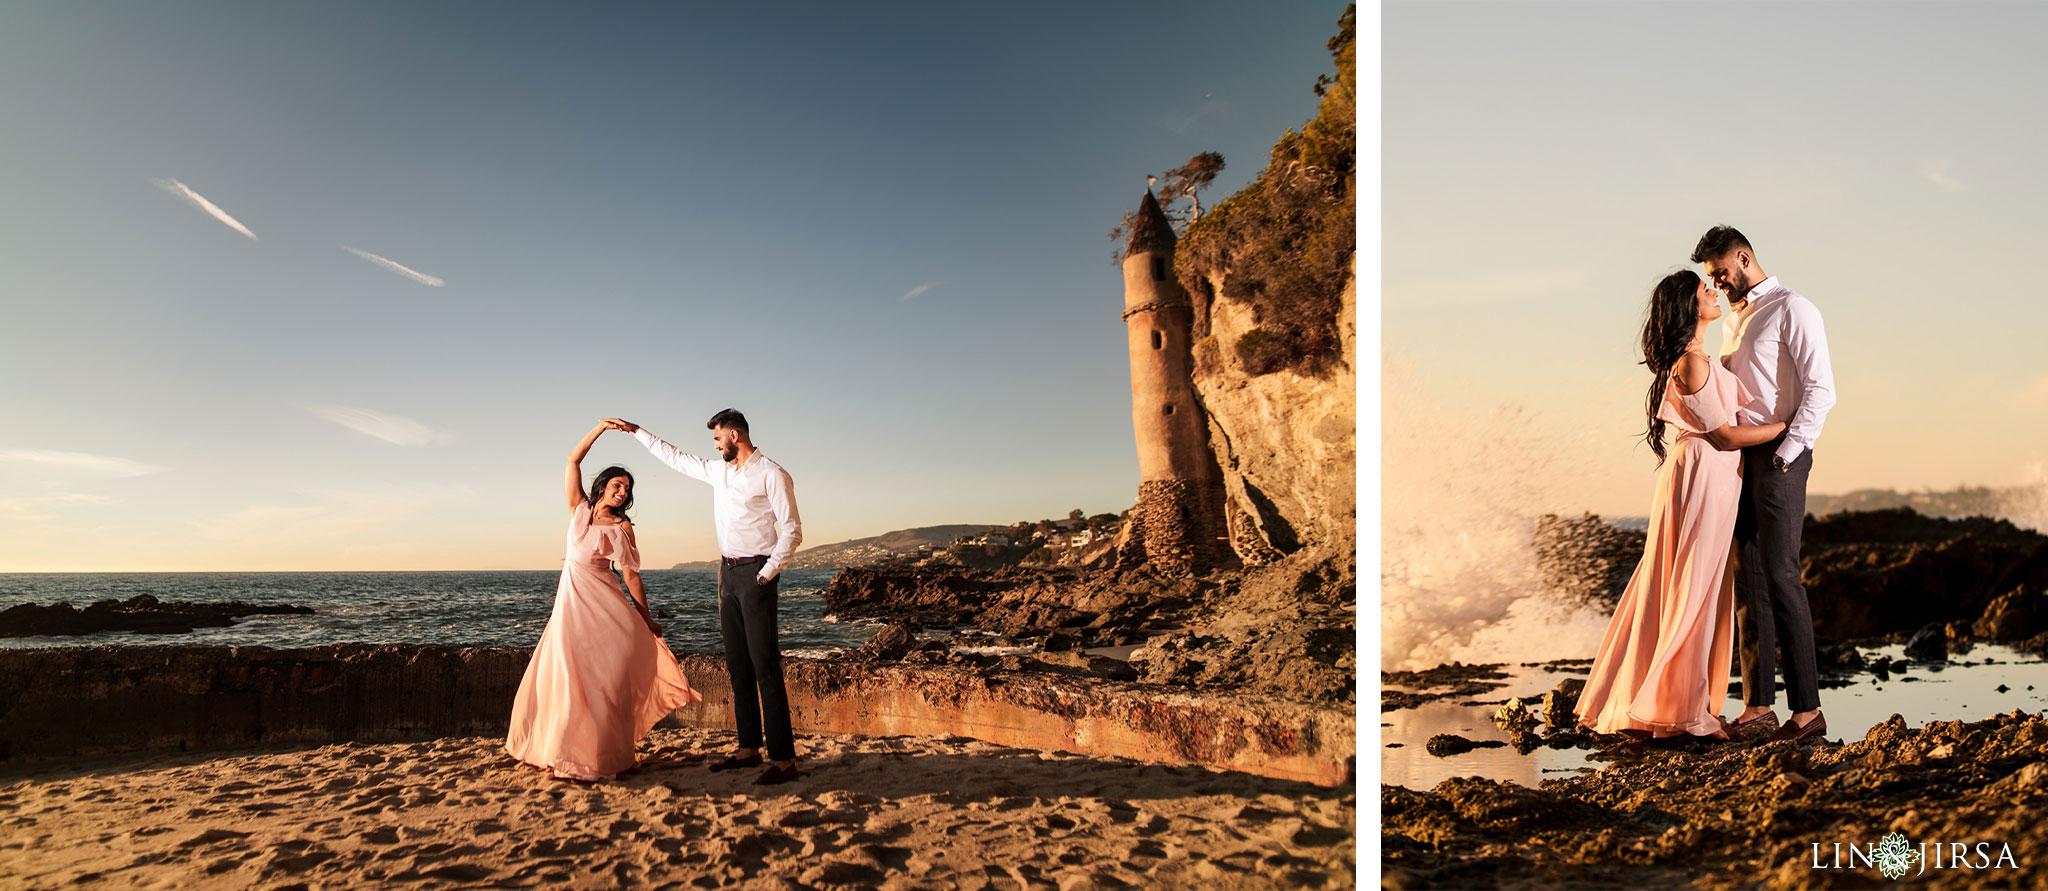 10 laguna beach post wedding photography